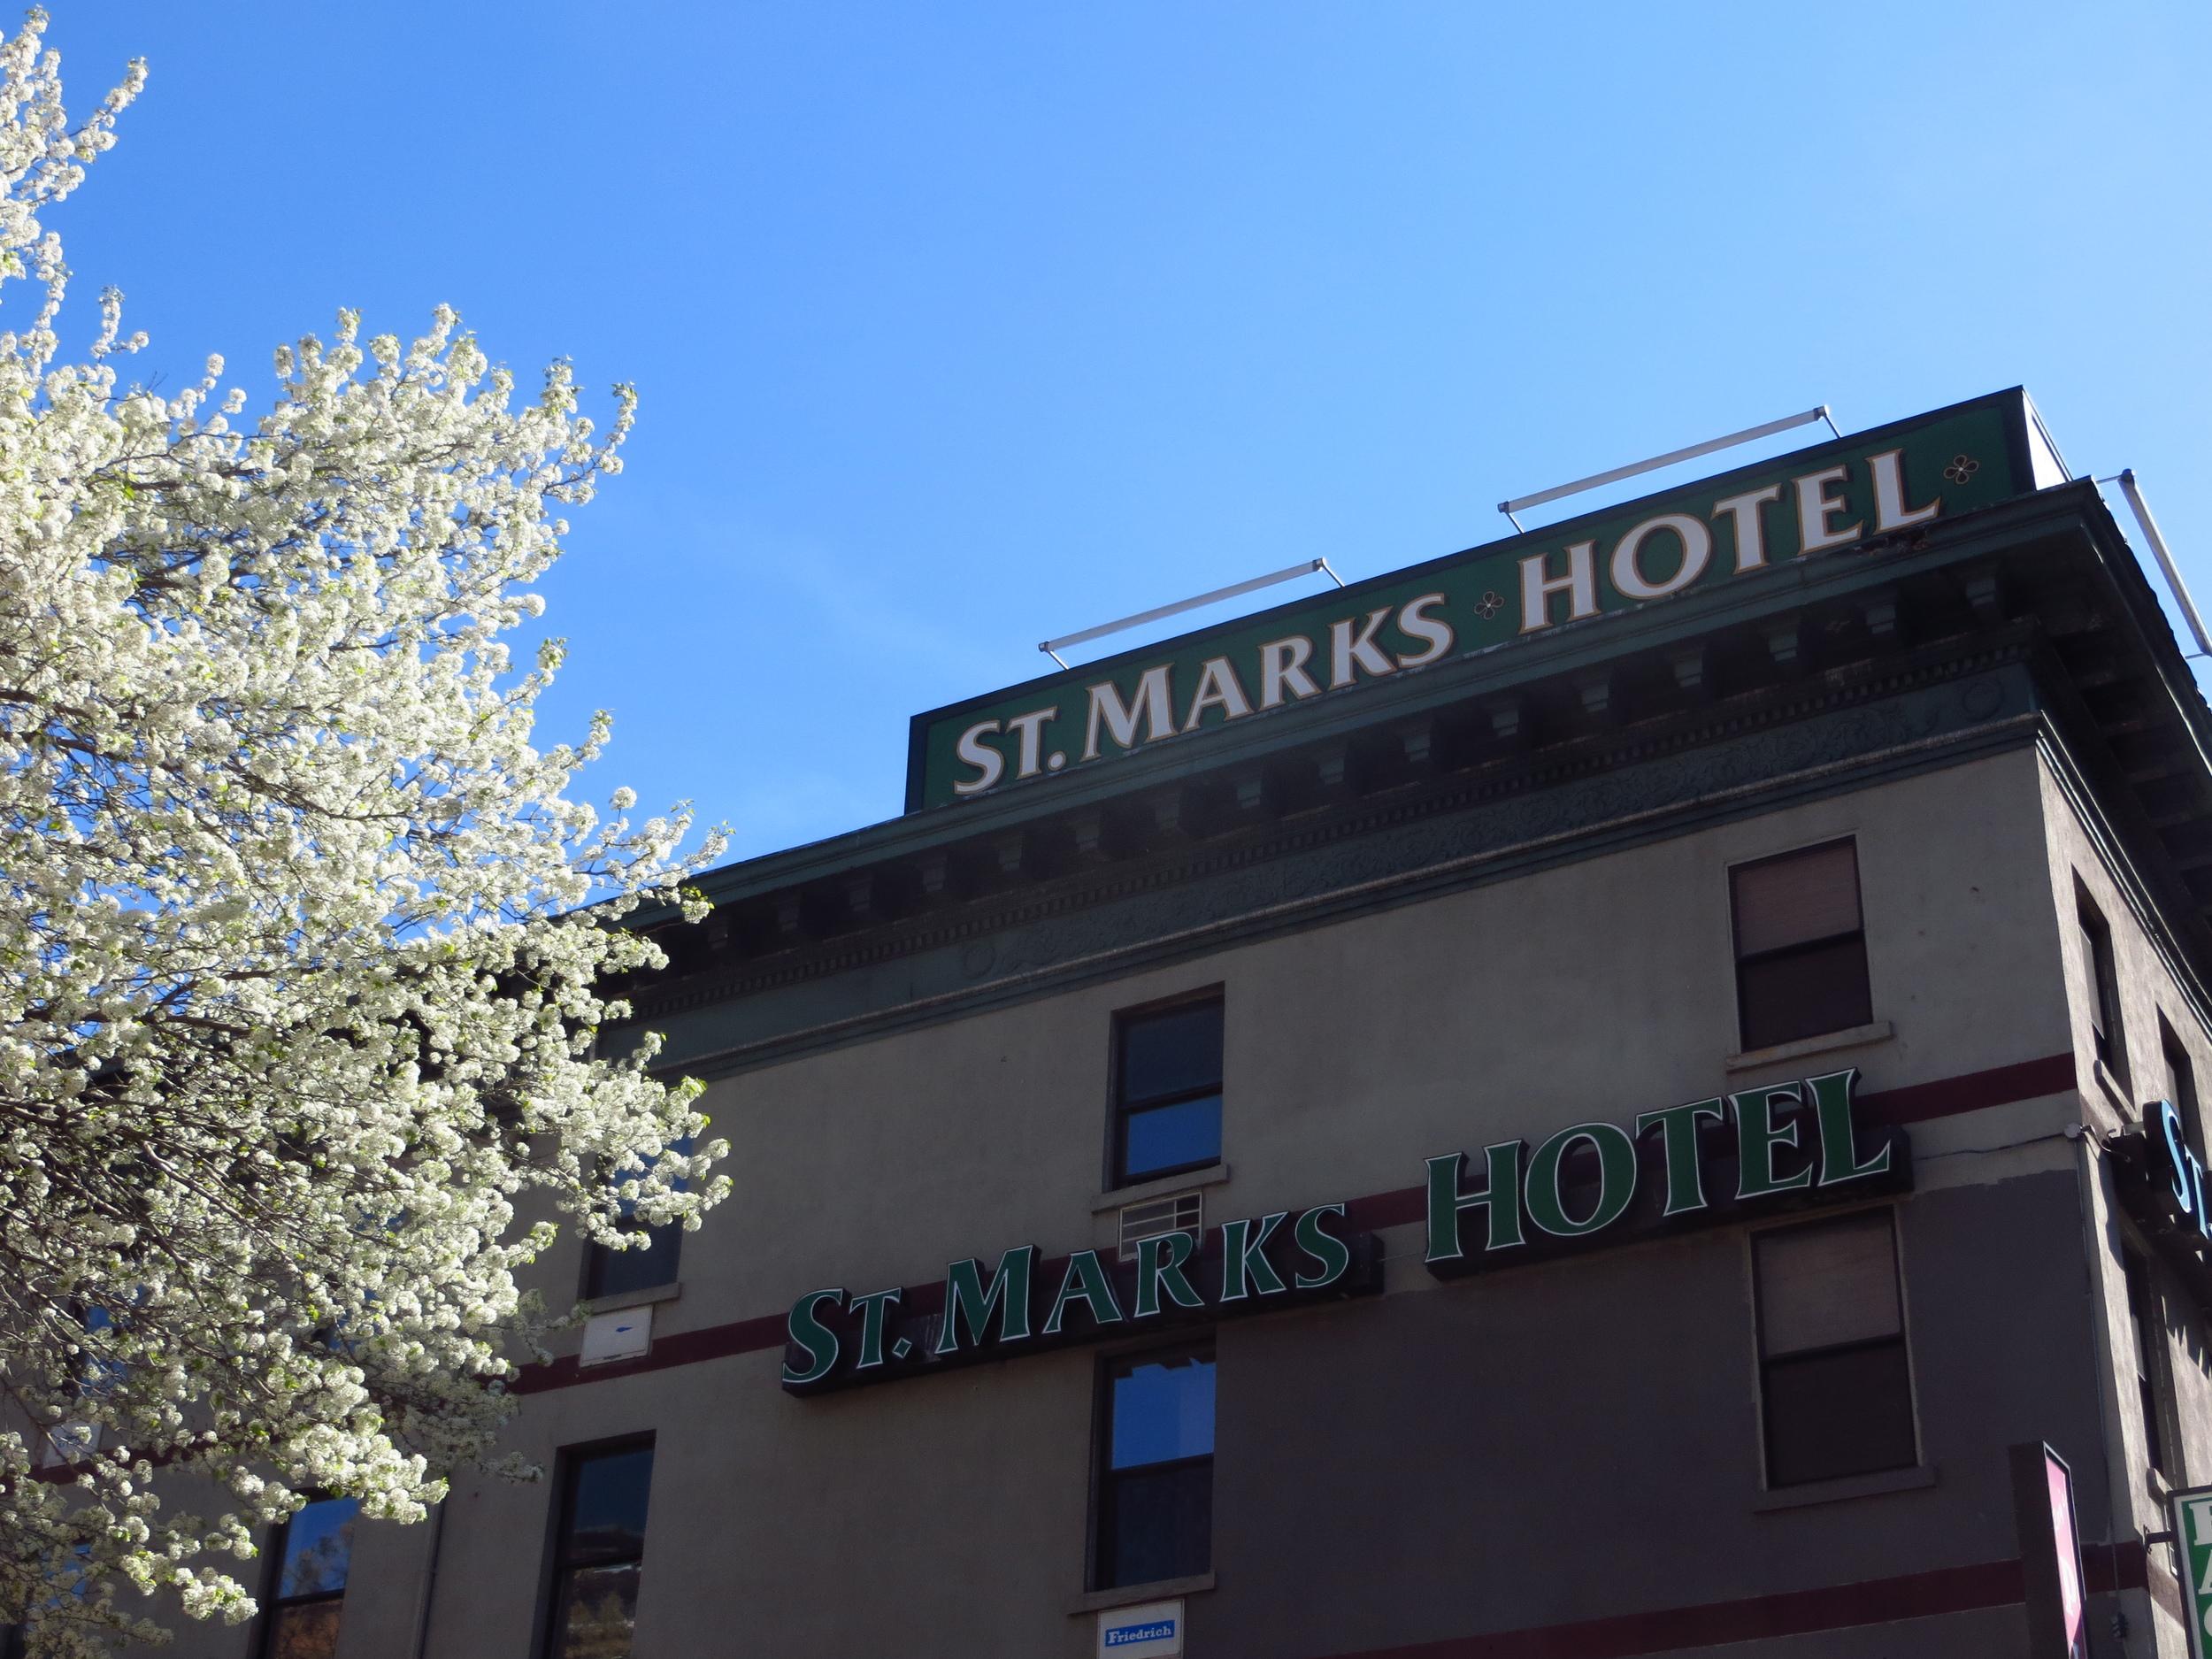 St. Marks Hotel